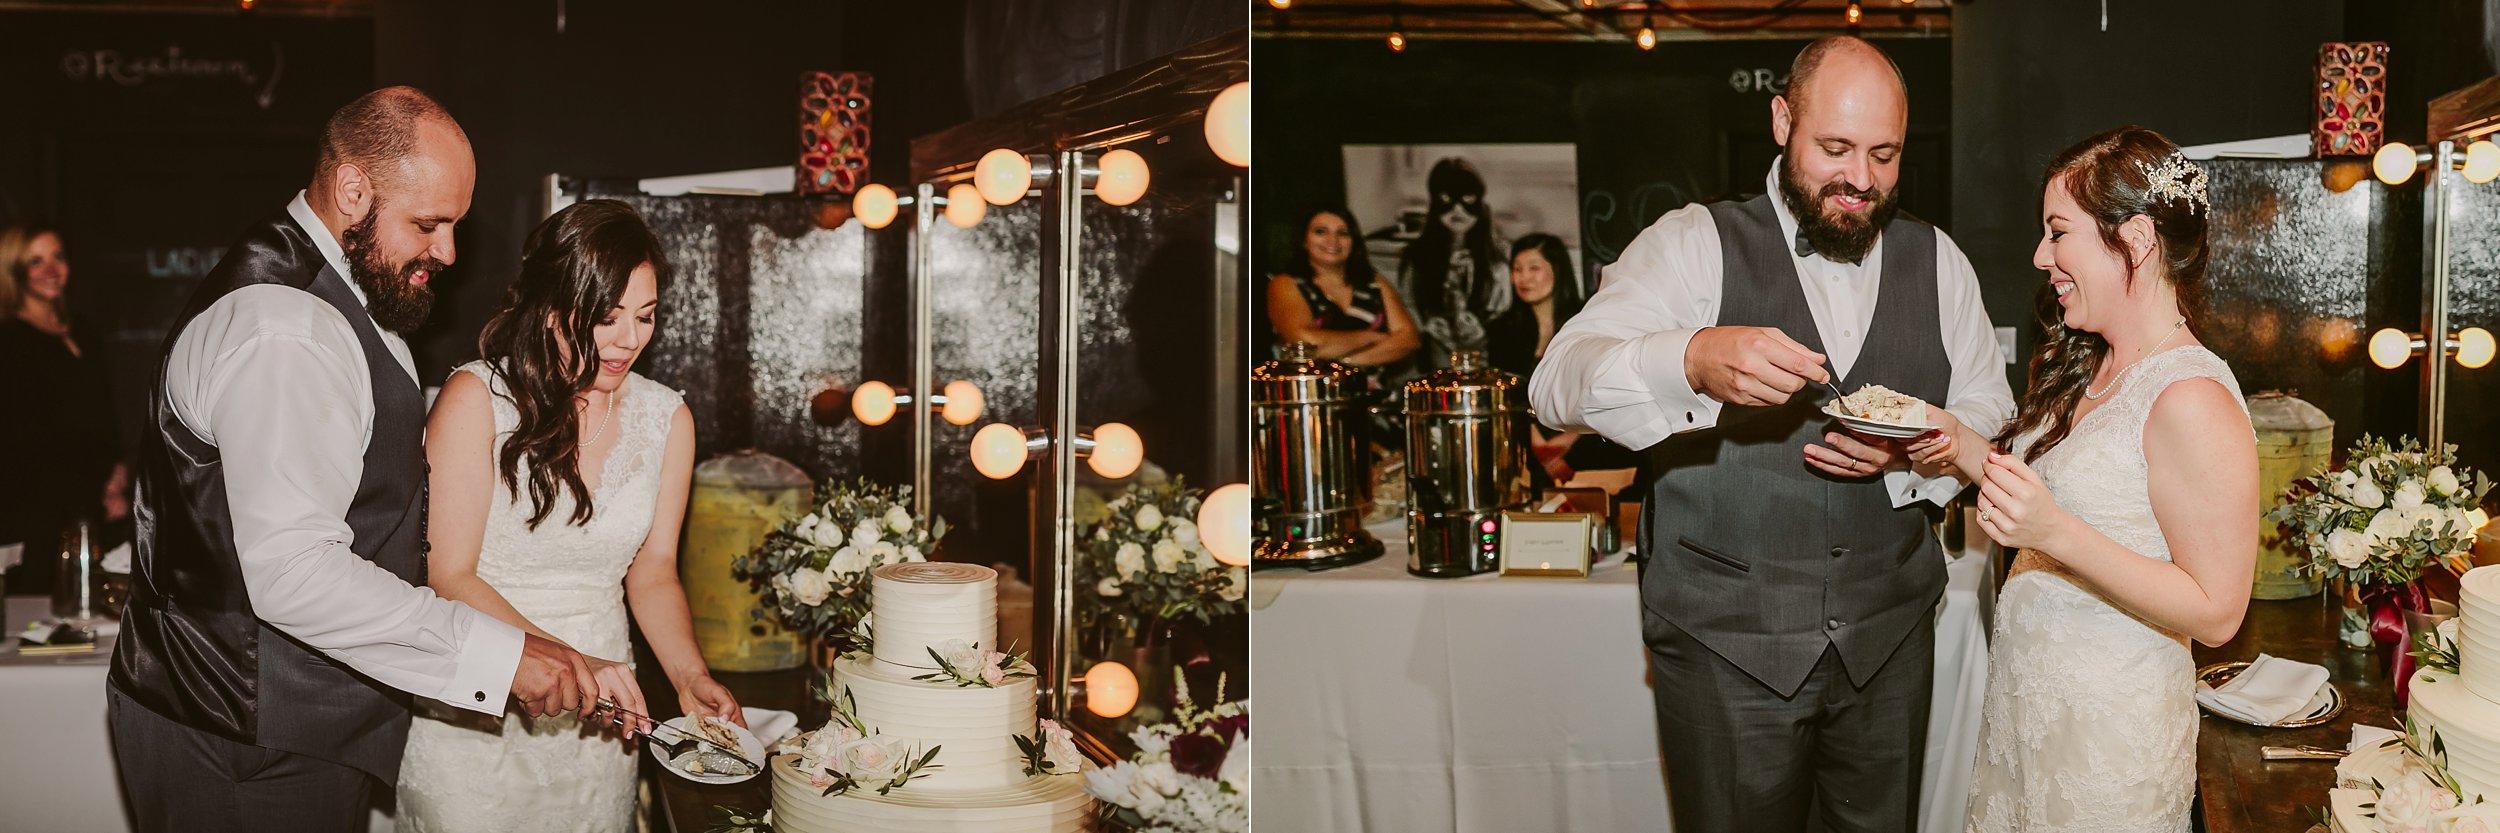 Smoky Hollw Studios Wedding_0039.jpg